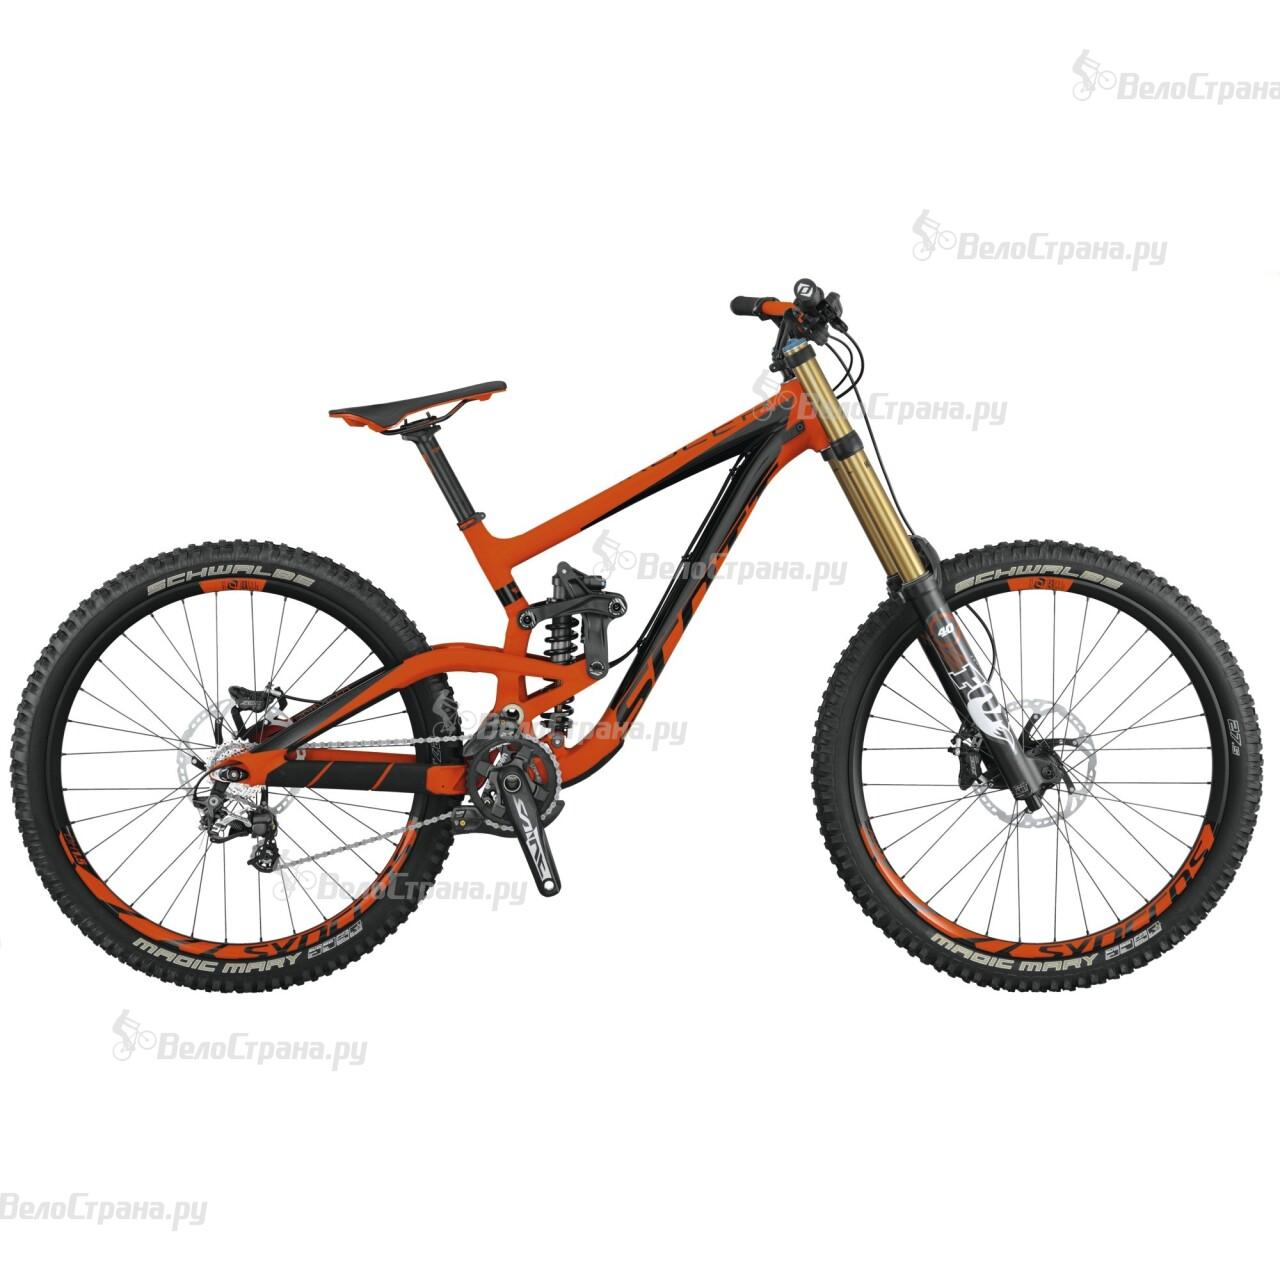 Велосипед Scott GAMBLER 710 (2015) велосипед scott gambler 720 2015